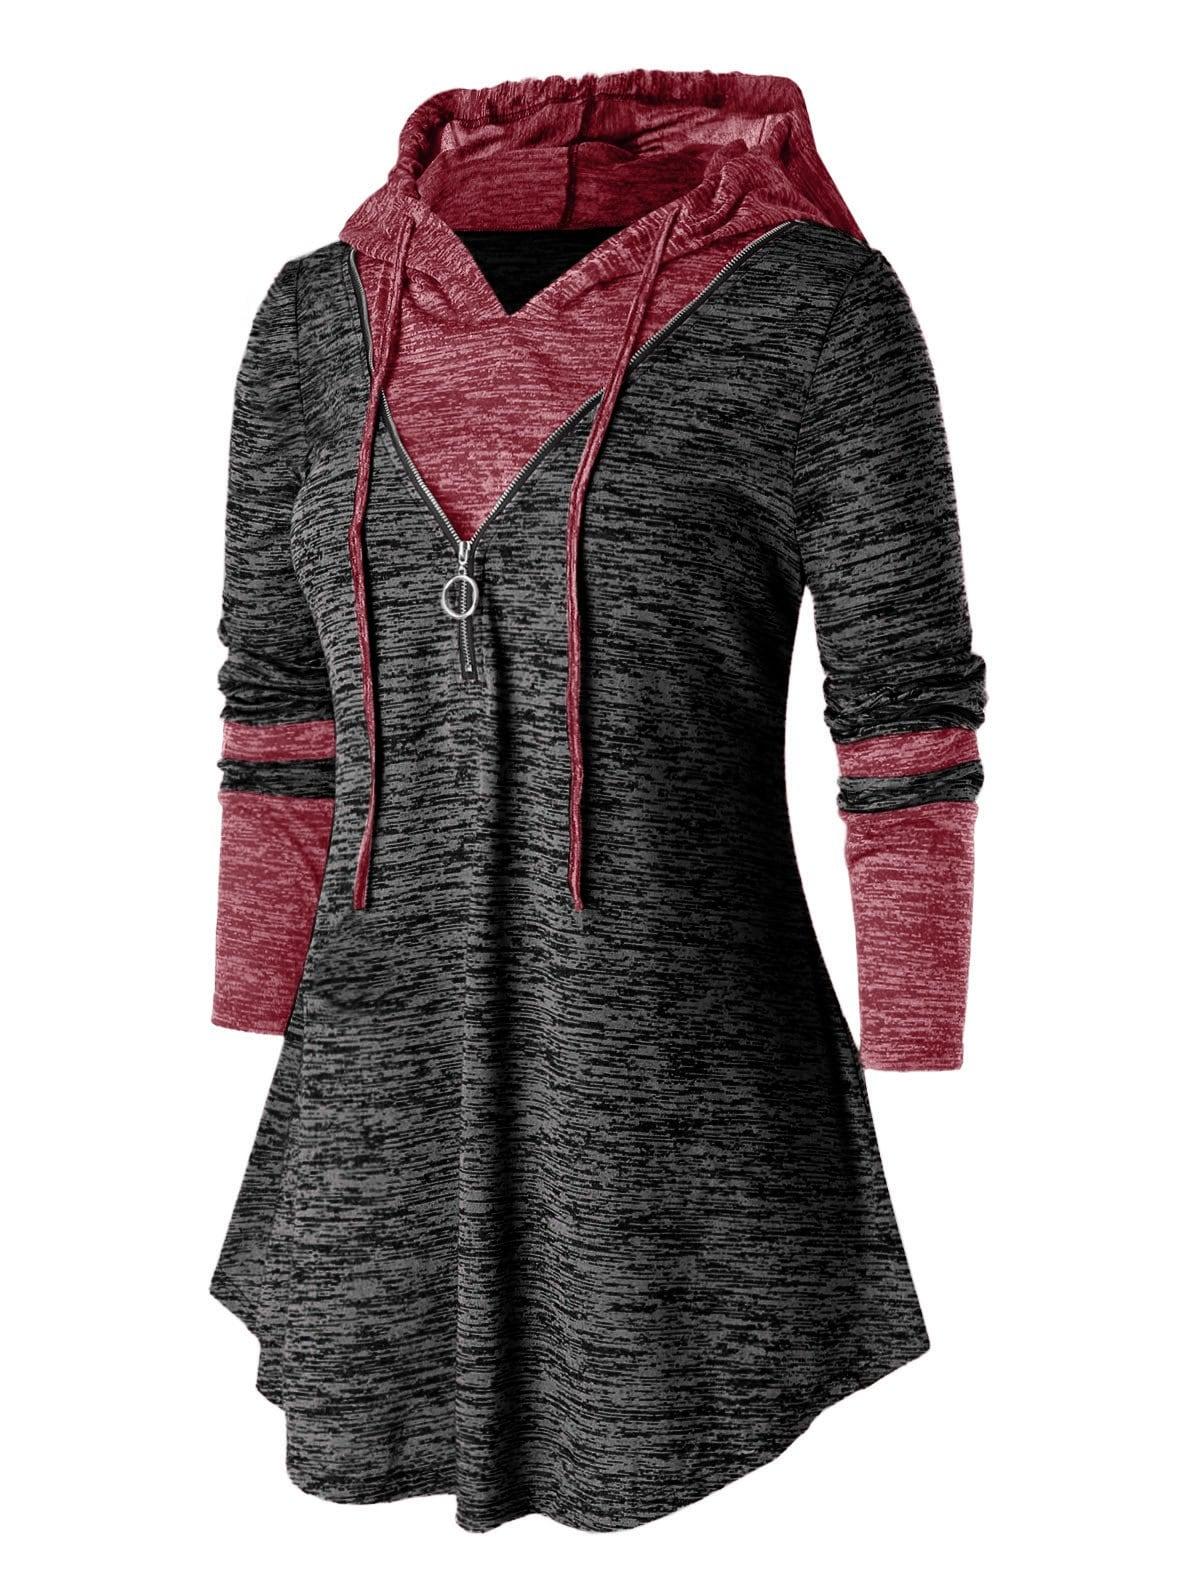 Plus Size Hooded Zipper Space Dye T Shirt